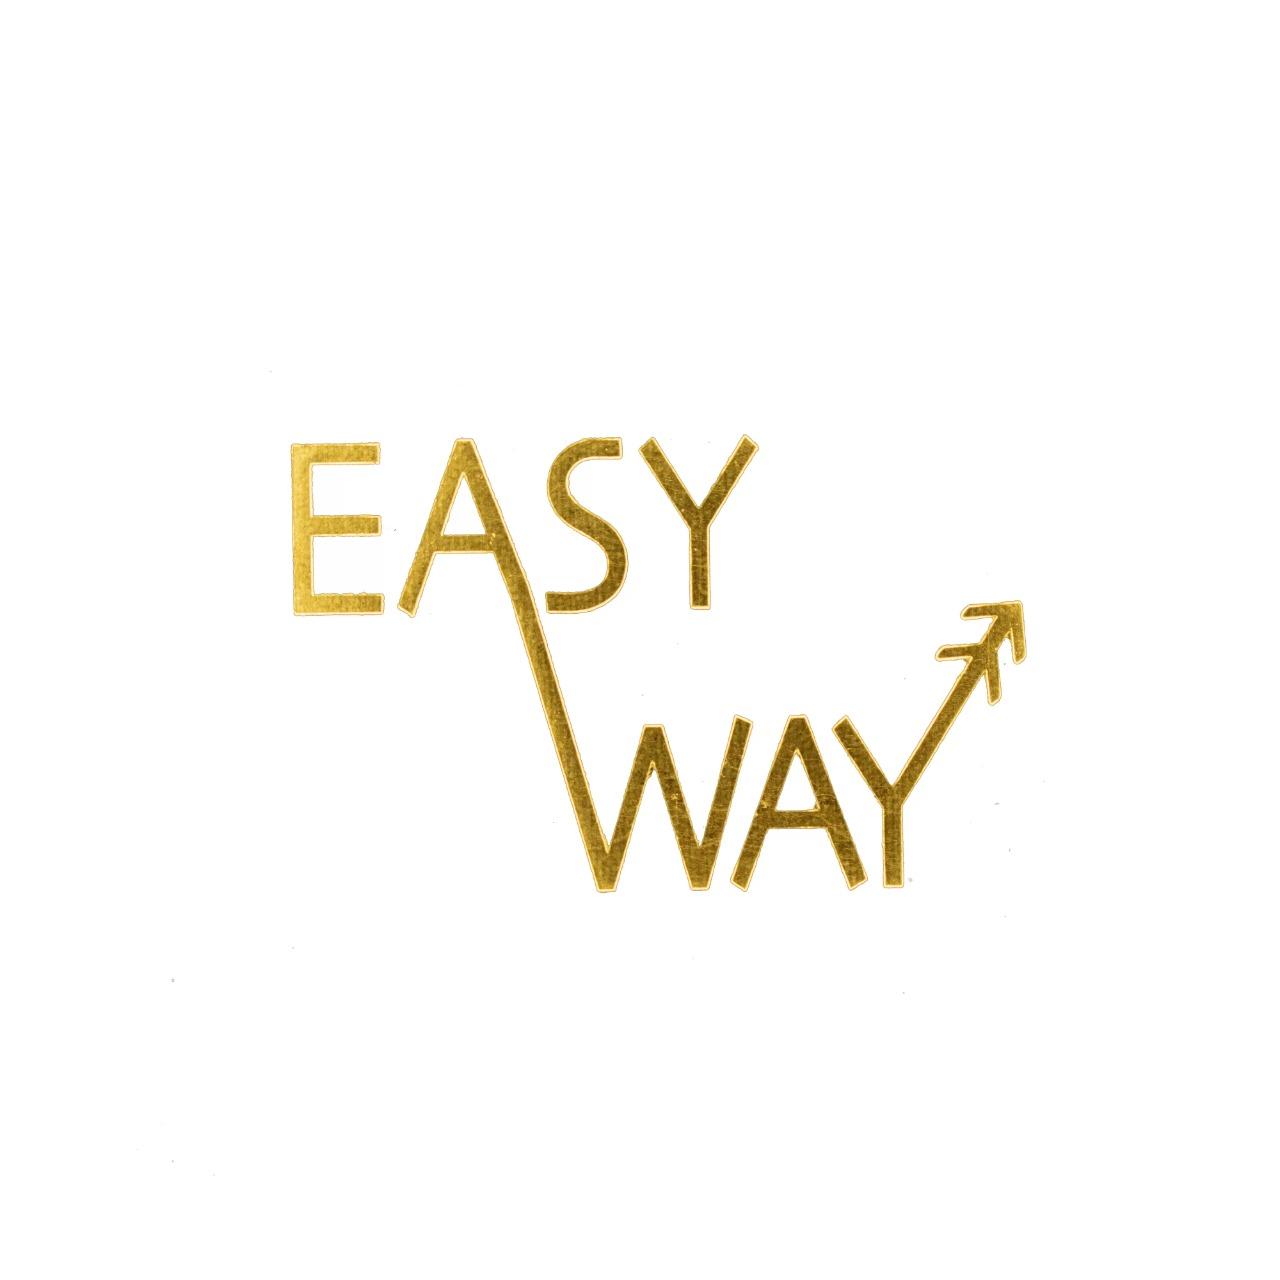 ايزي واي - EASY WAY